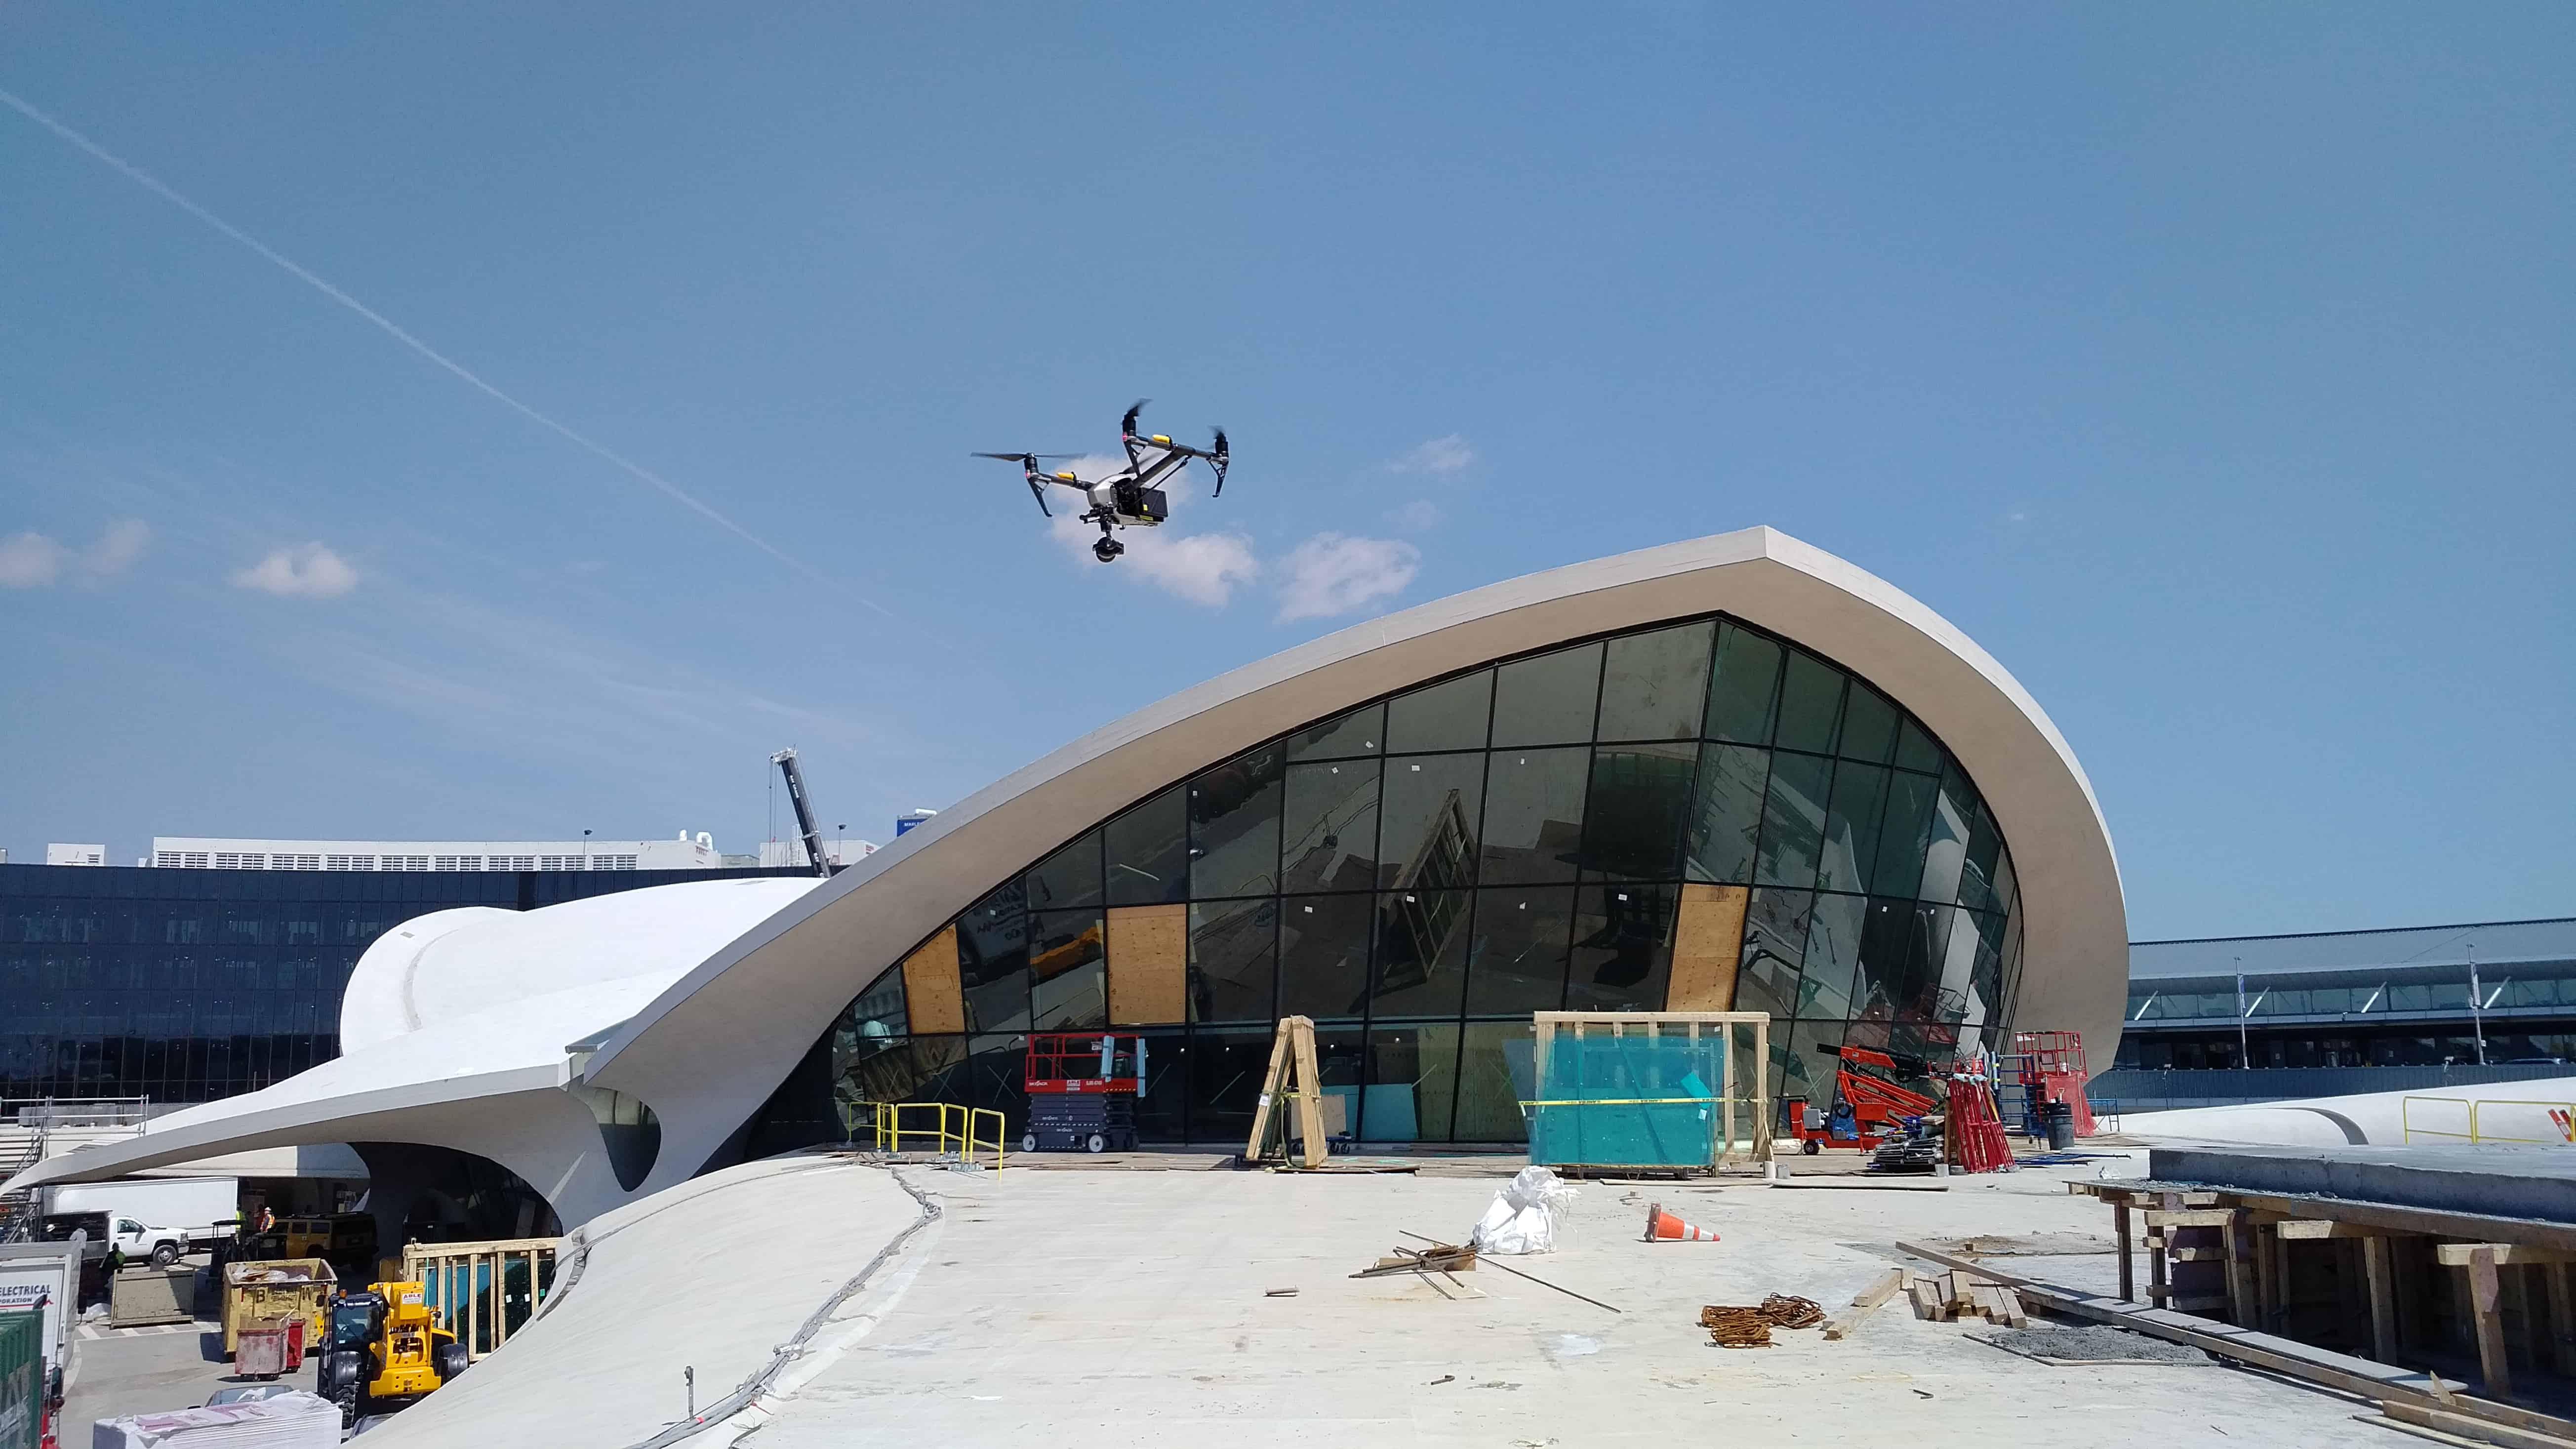 jfk-drone-flight